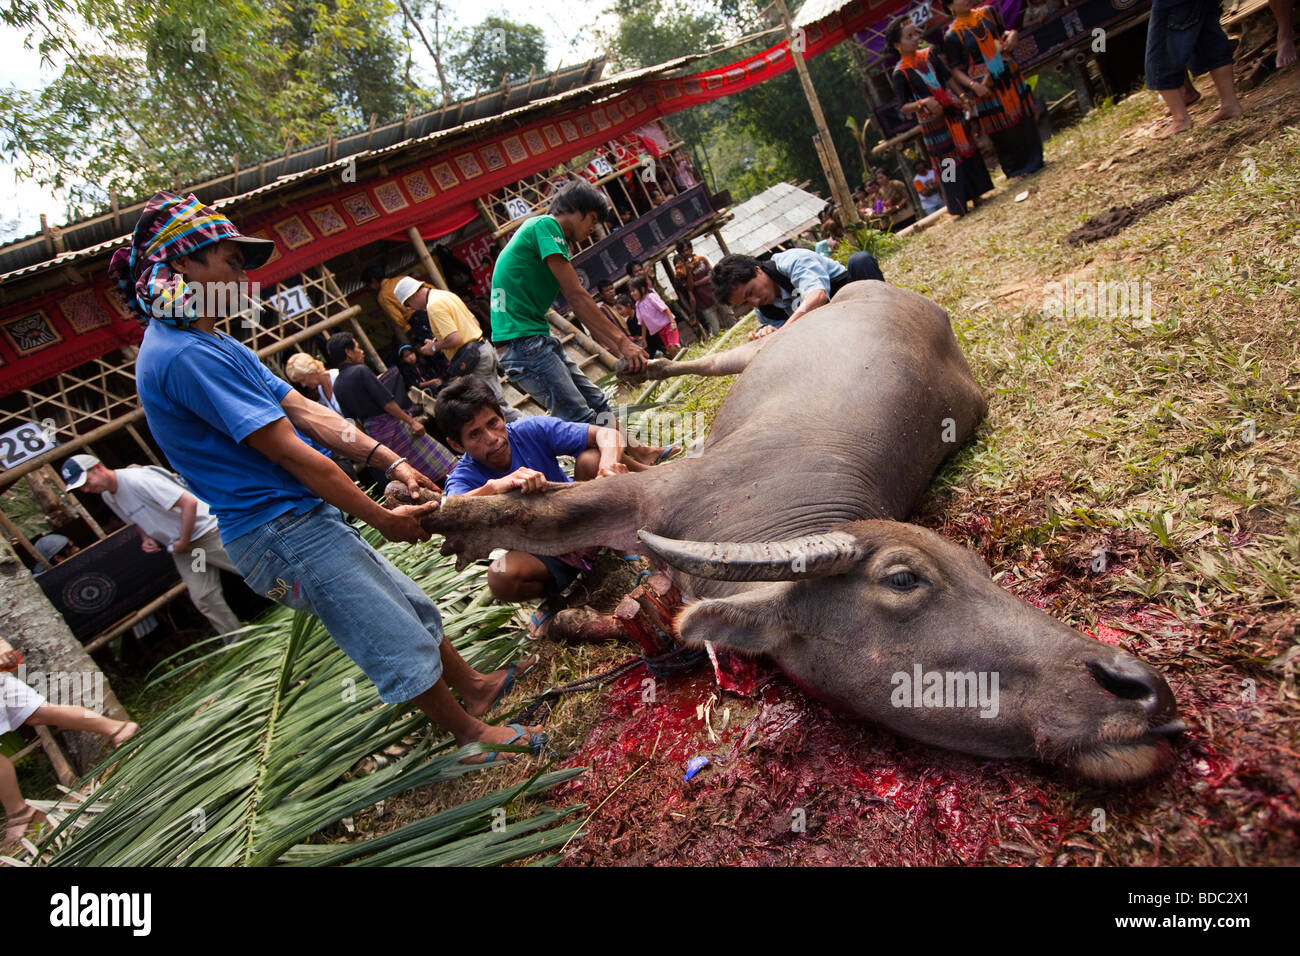 Indonesia Sulawesi Tana Toraja Bebo village Torajan funeral skinning ritually slaughtered buffalo - Stock Image